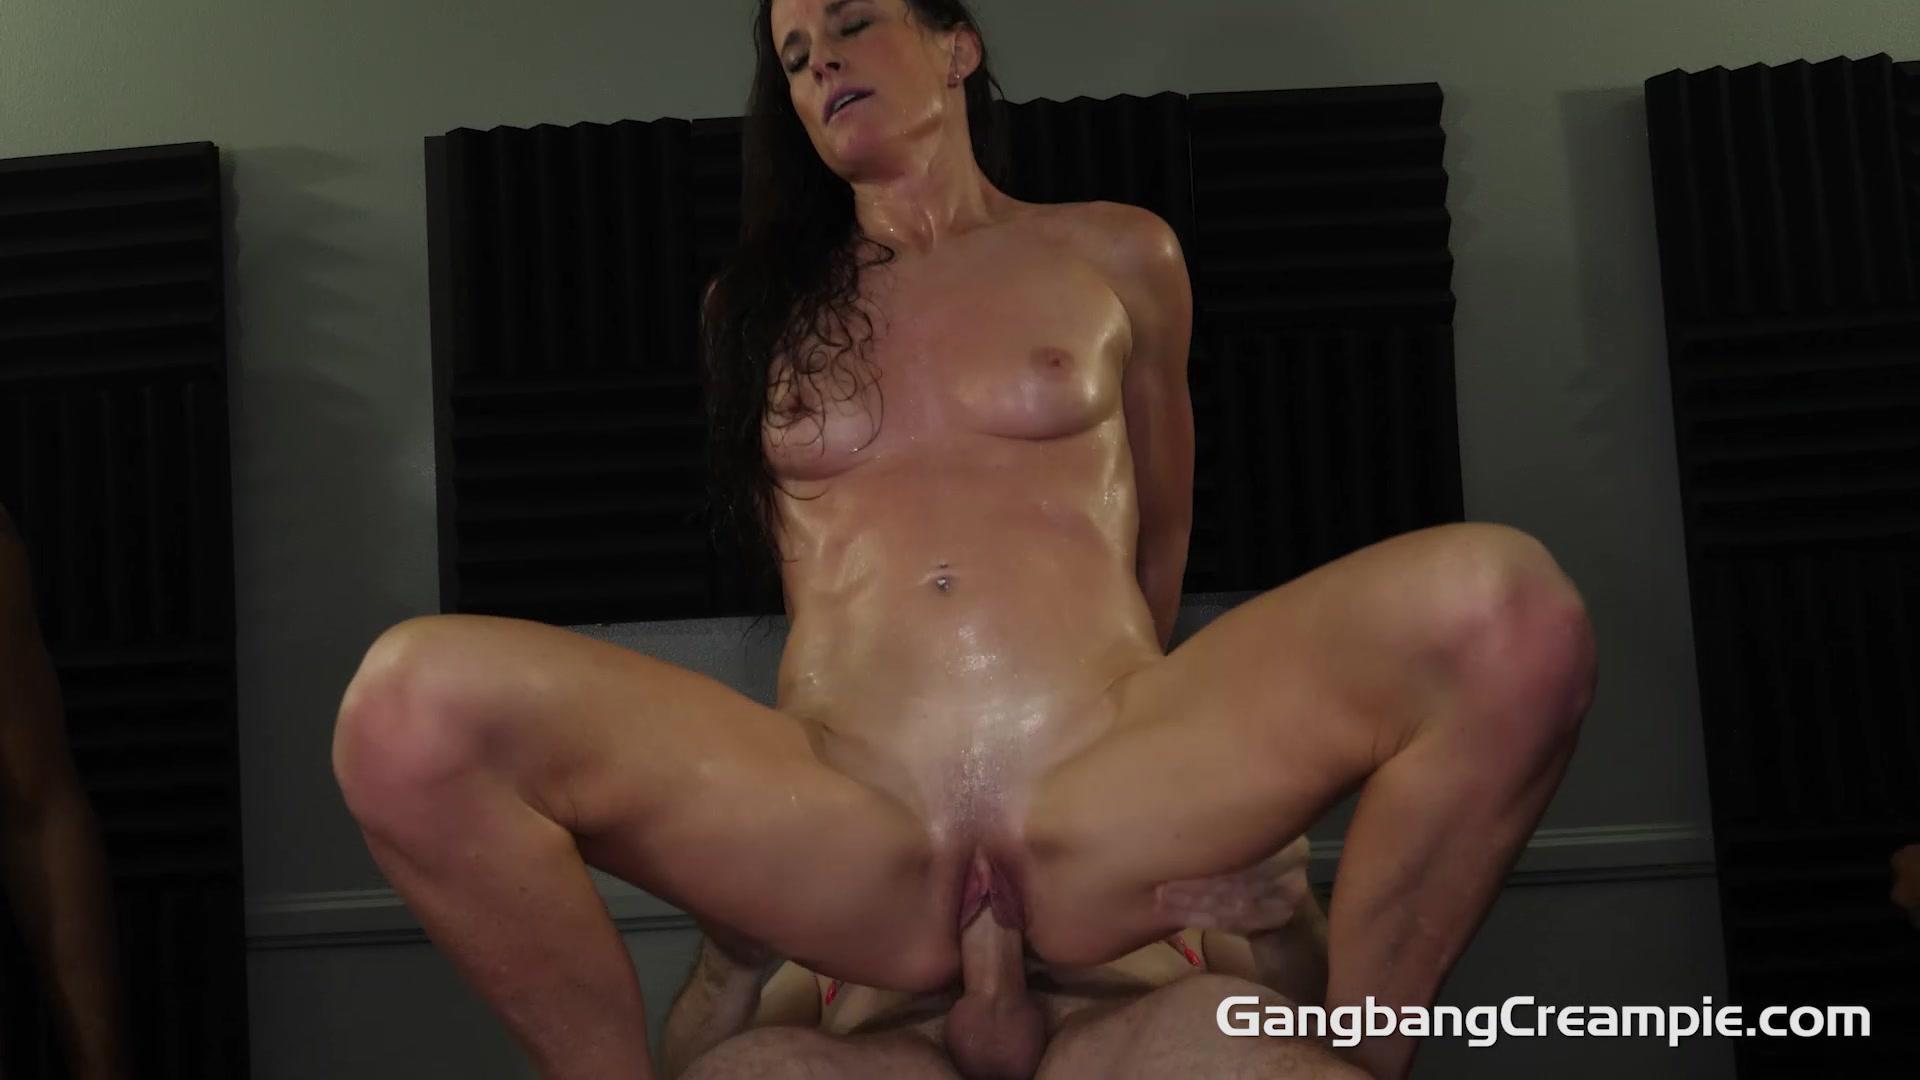 Gangbang Creampie – G263 Sofie Marie